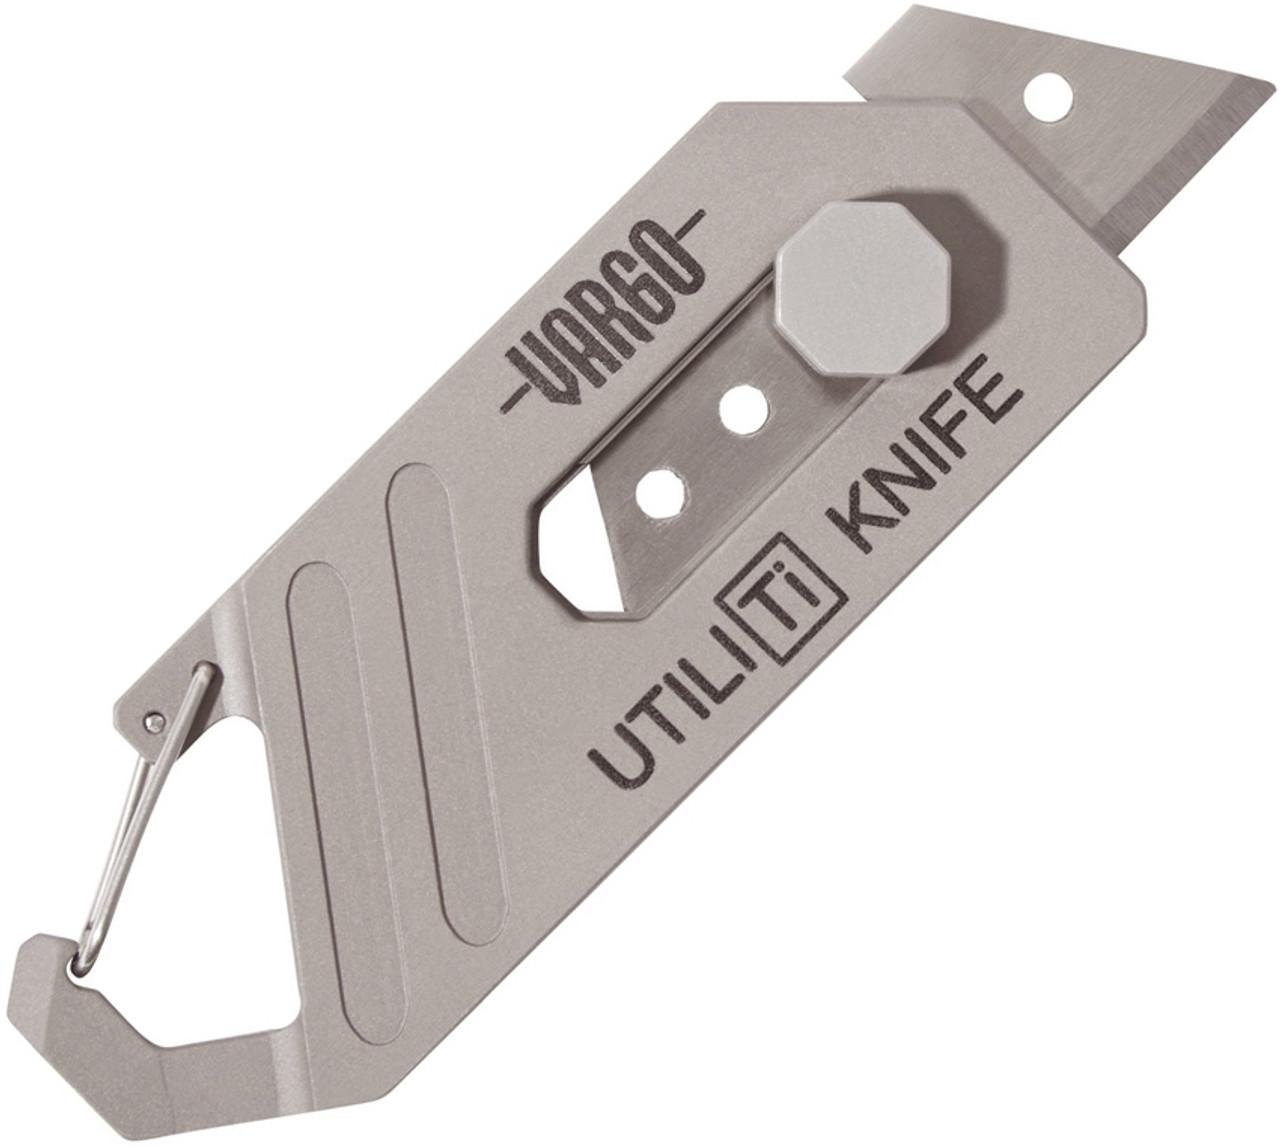 "Vargo Utili Ti Knife - 3"" Titanium Utility Knife with Carabiner (10 Blades)"